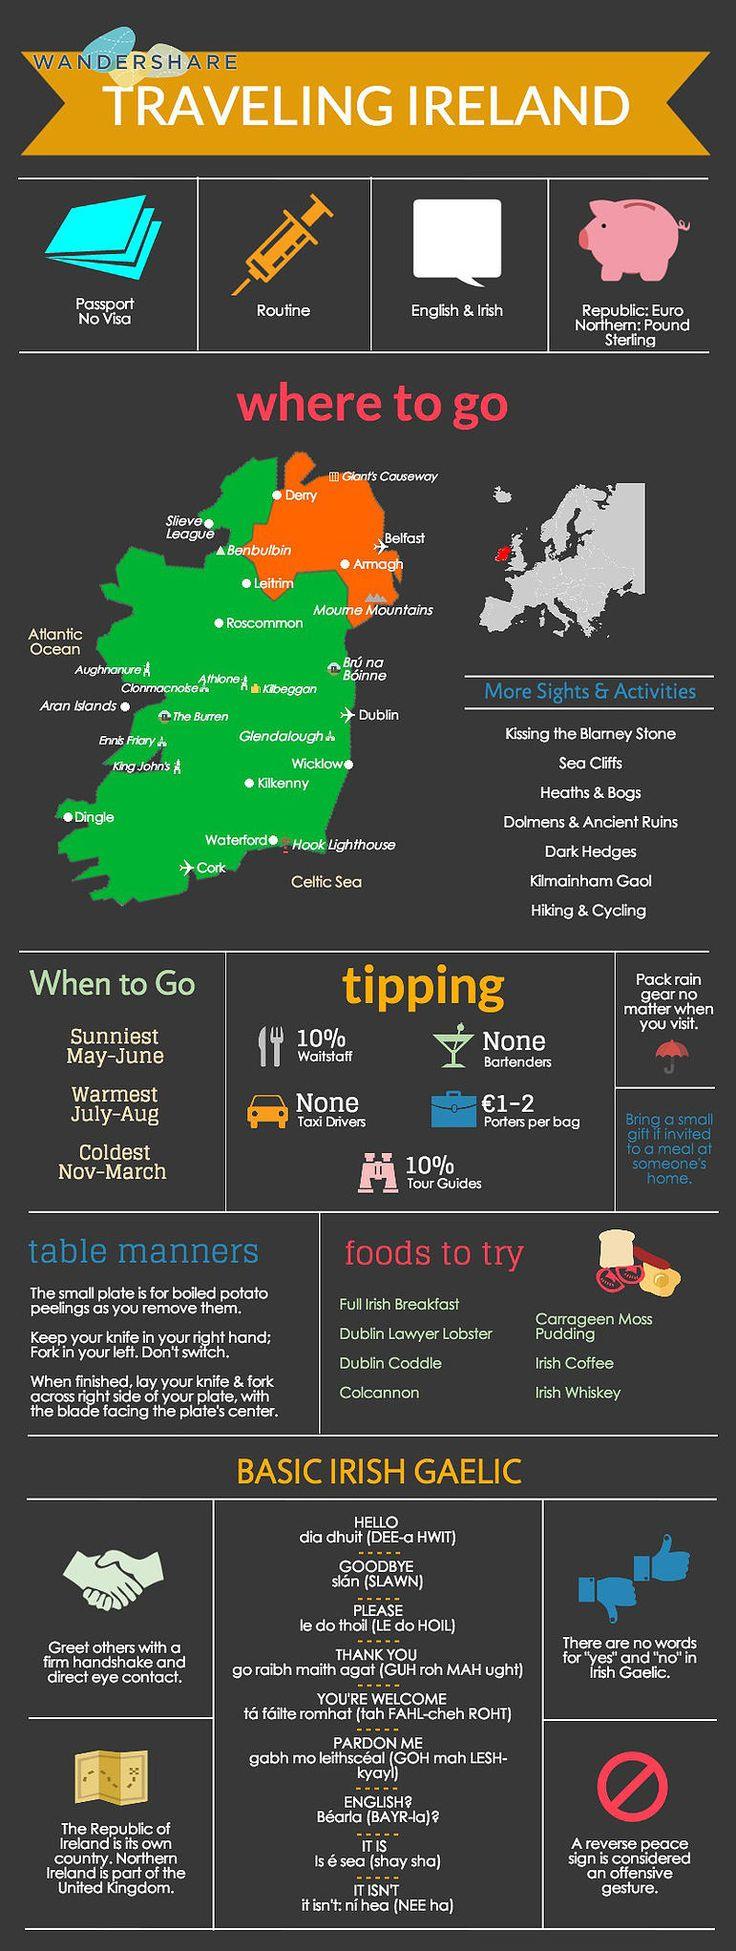 Ireland Guide